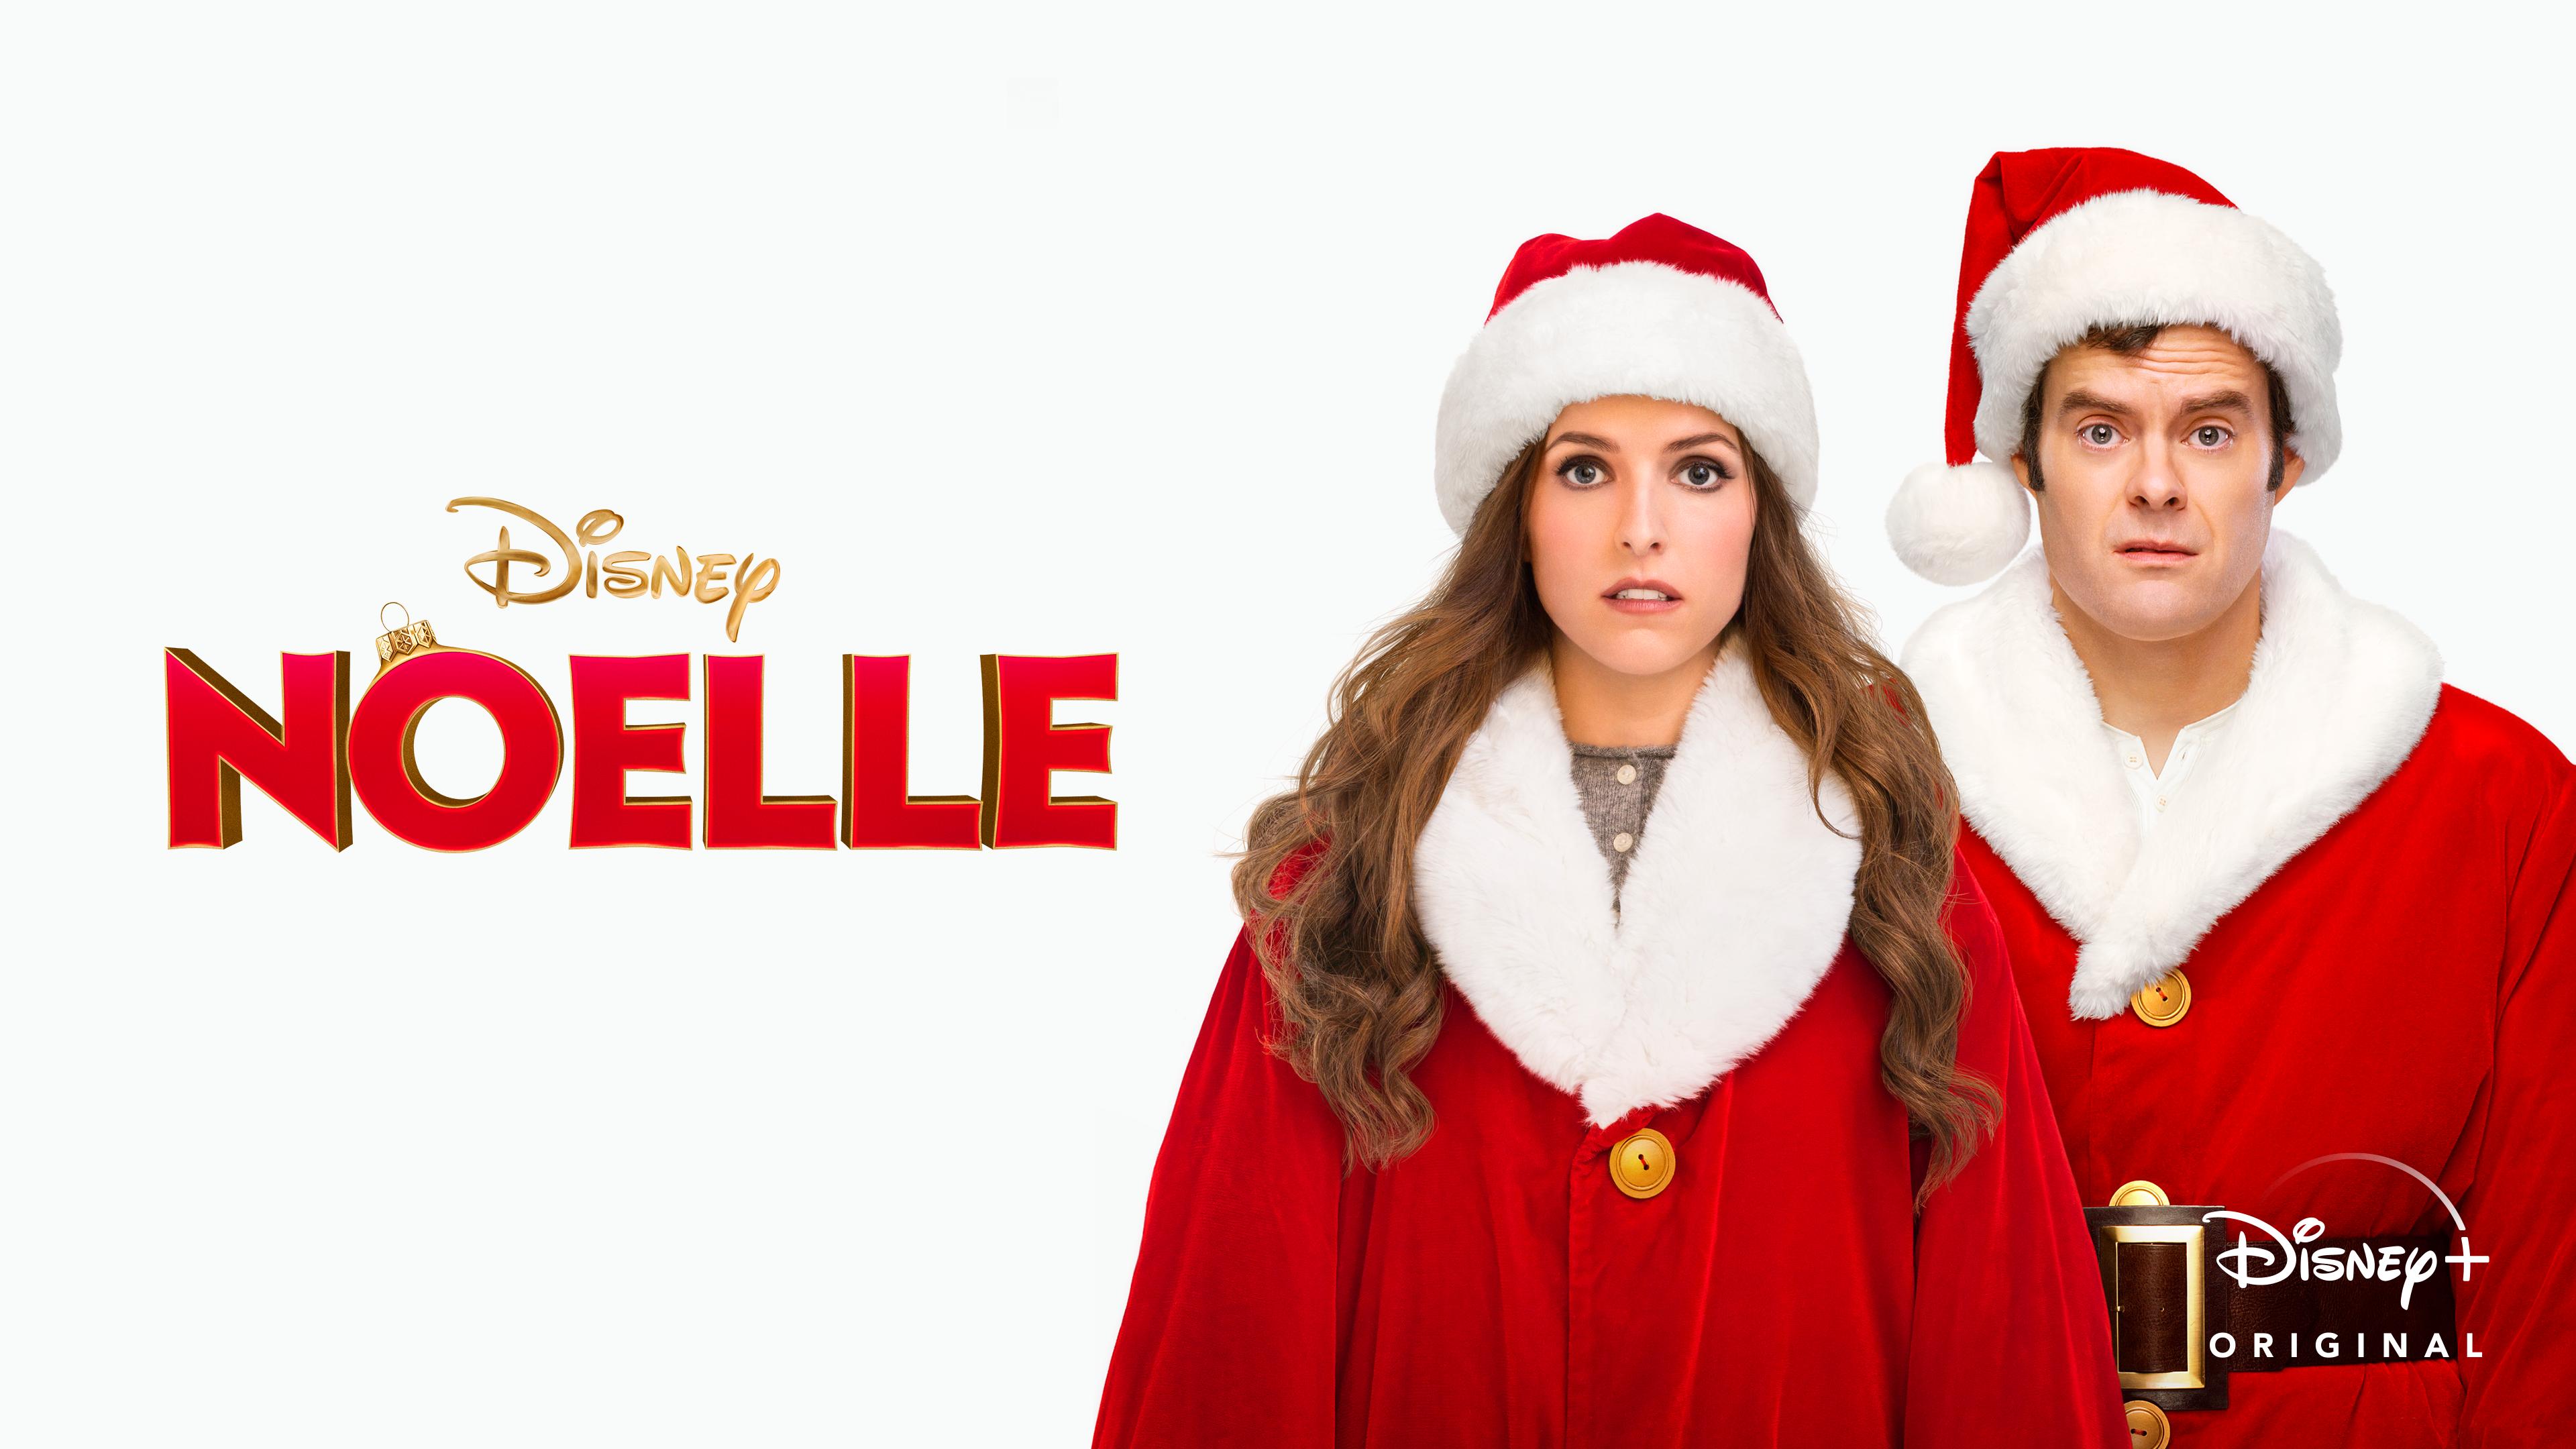 Noelle Disney+ 10 film di Natale